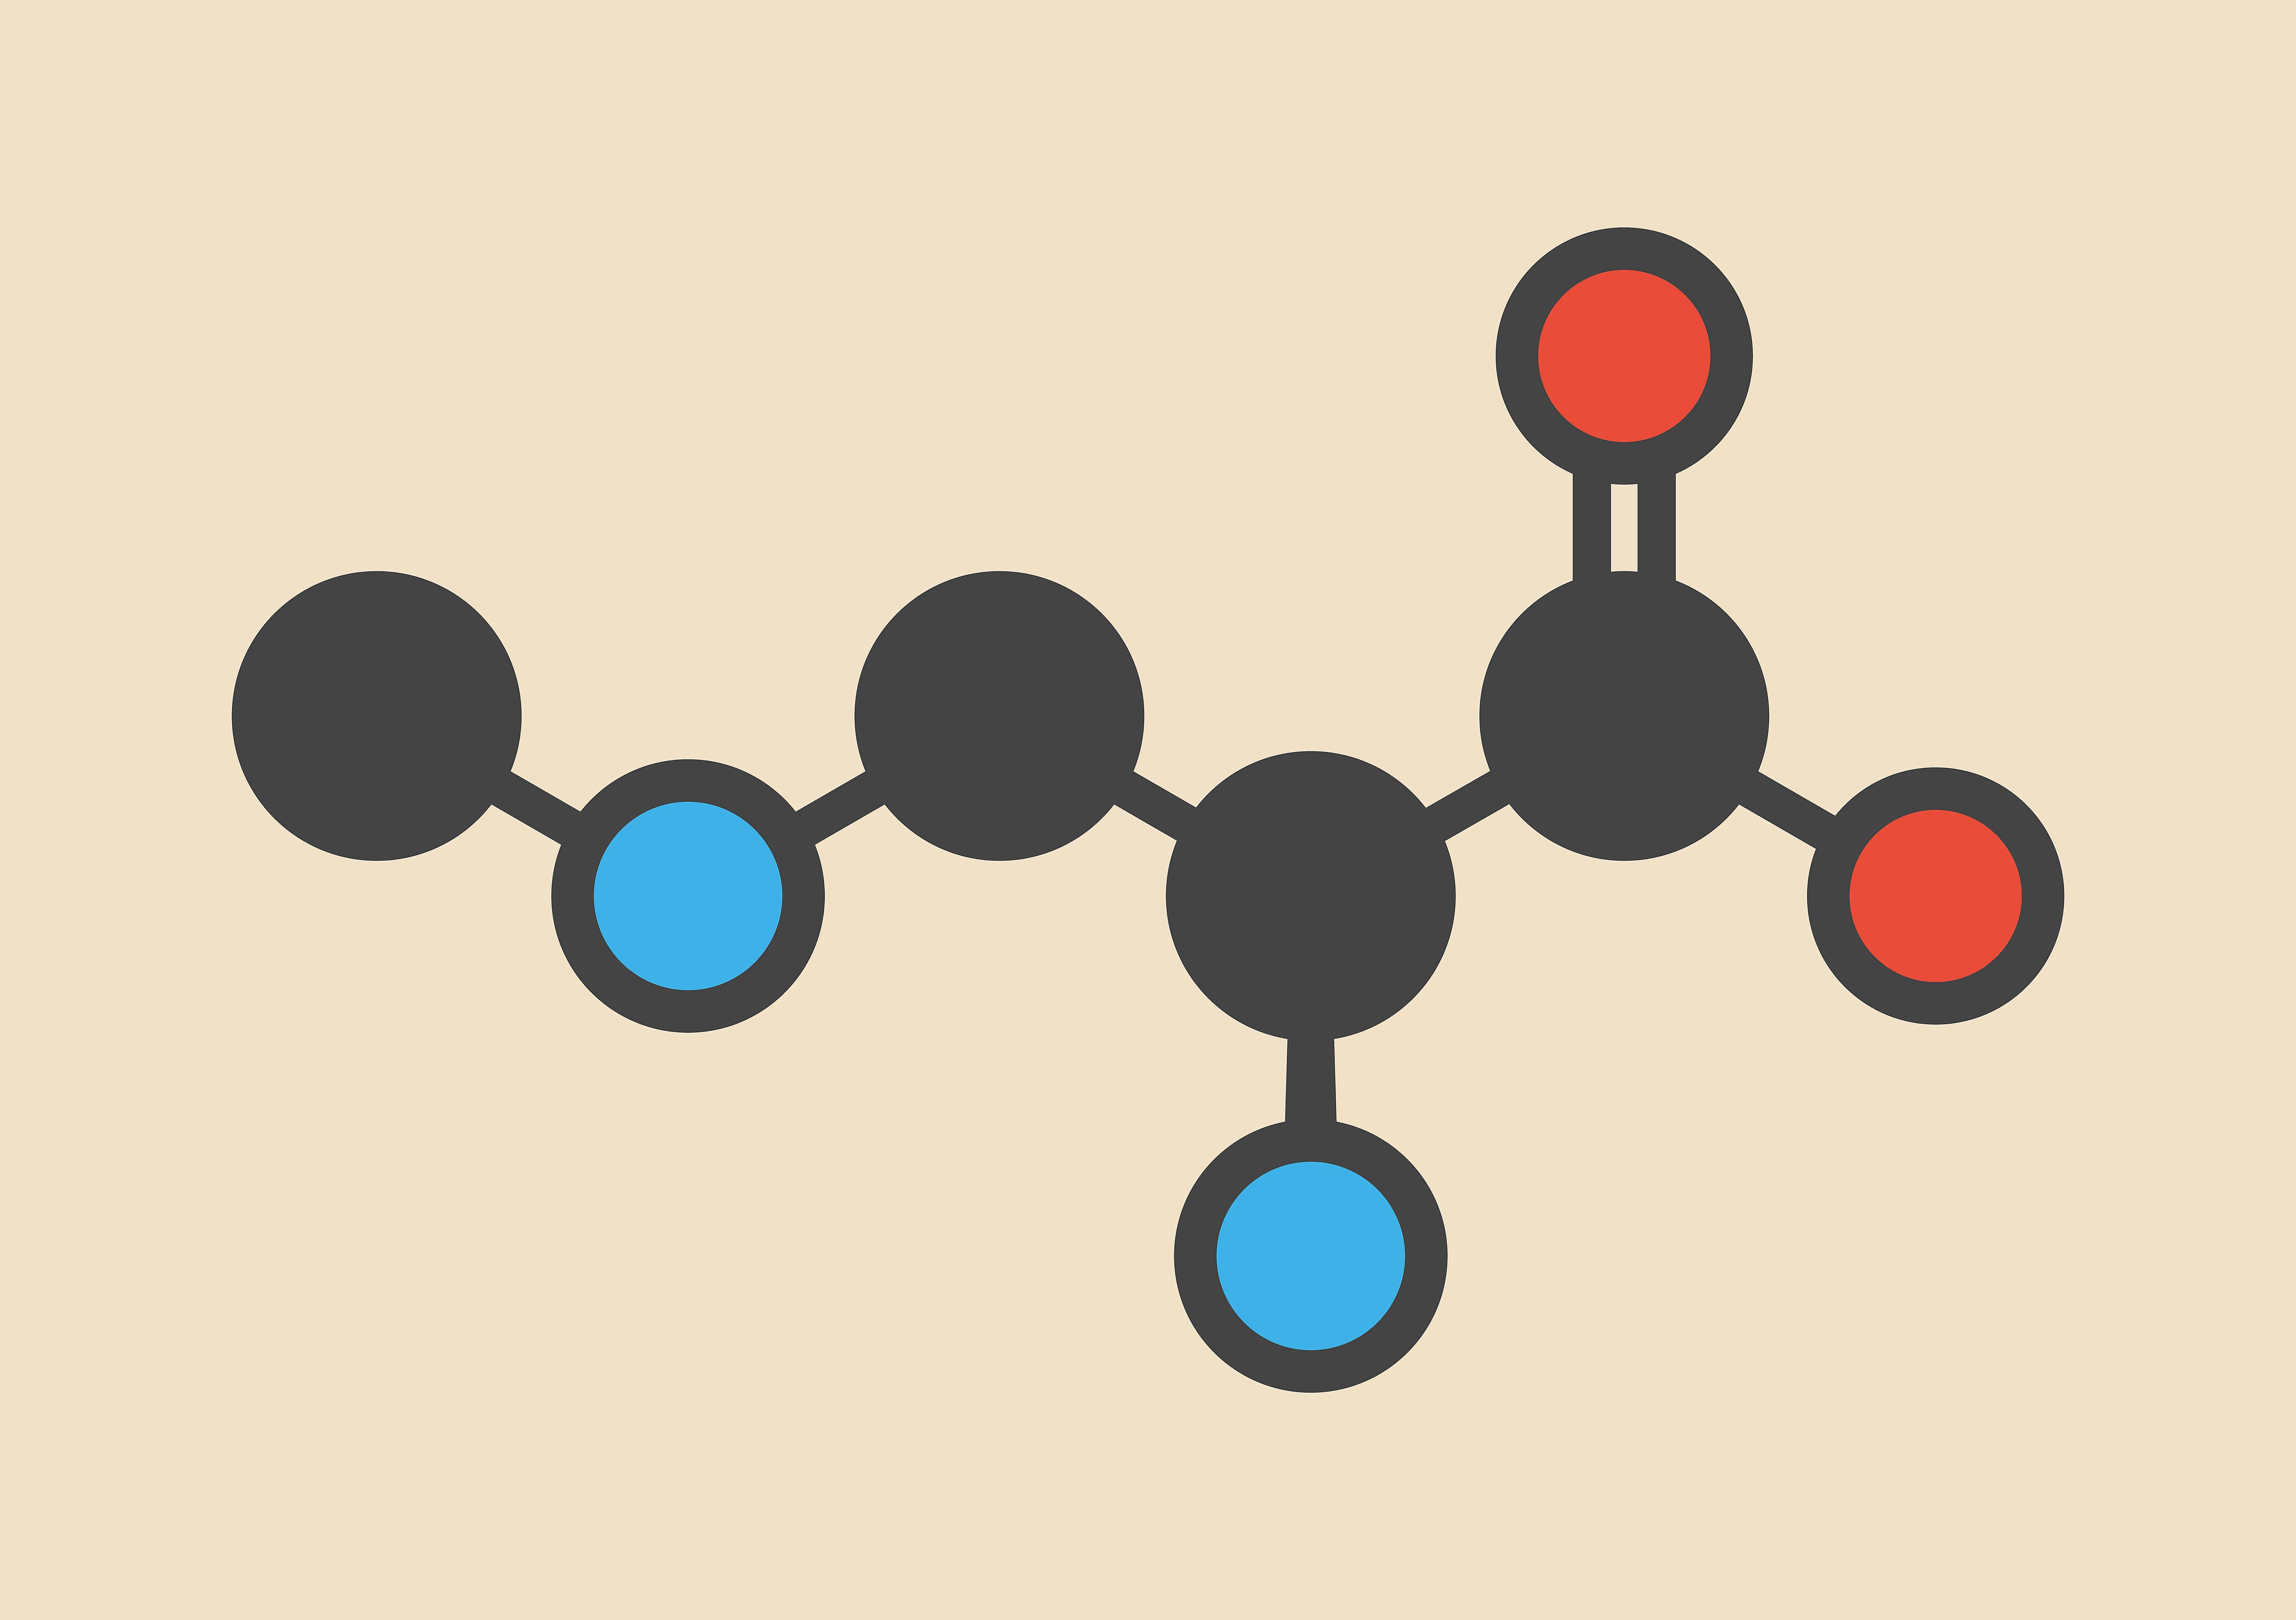 The beta-Methylamino-L-alanine molecule has the amino functional group.